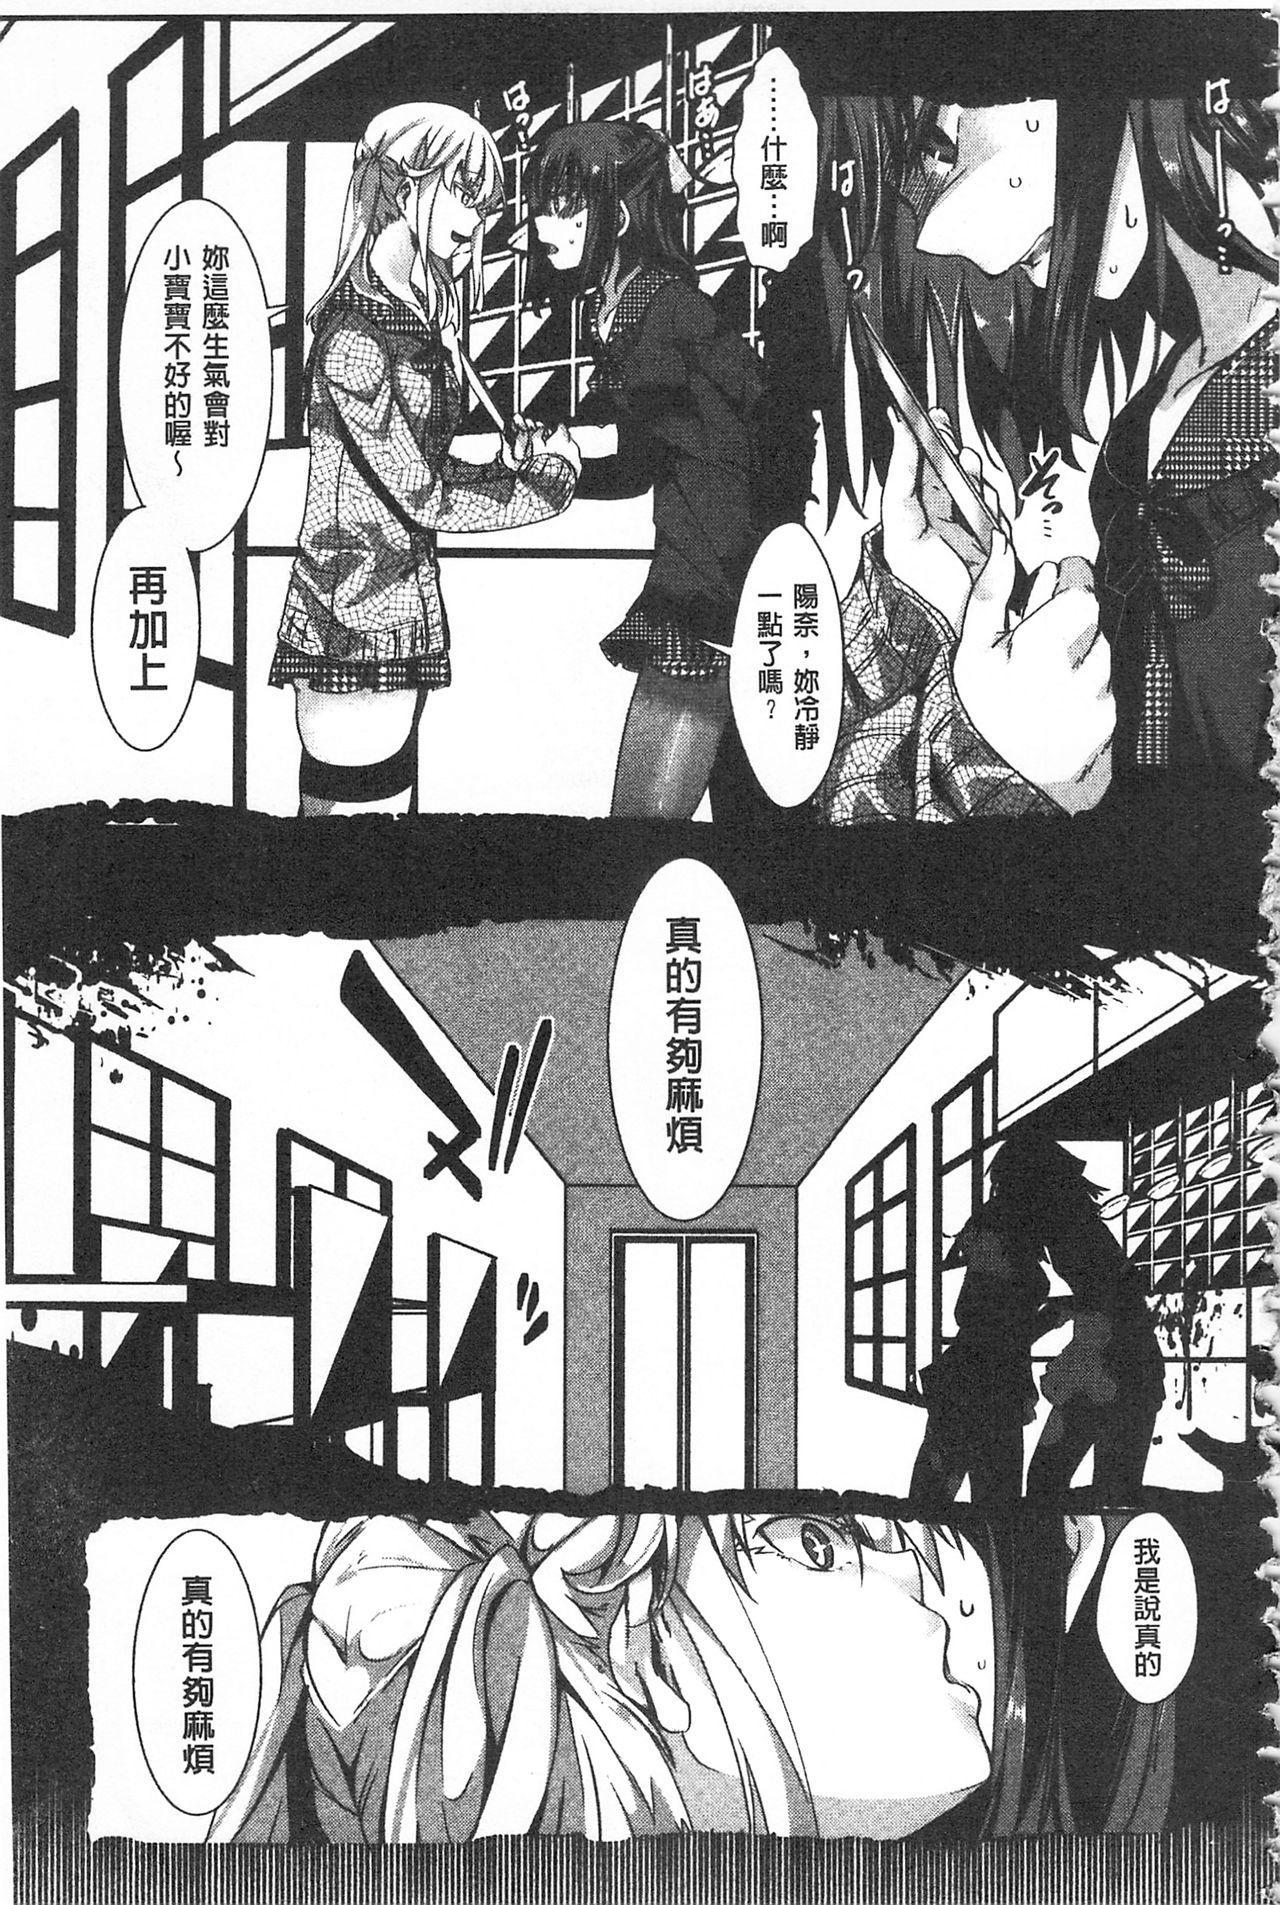 [hal] Daienjou -Ikare Ikasare Iki Ikare-   ∞艶嬢 -洩出來被搞到洩掛了被搞掛-  [Chinese] 192